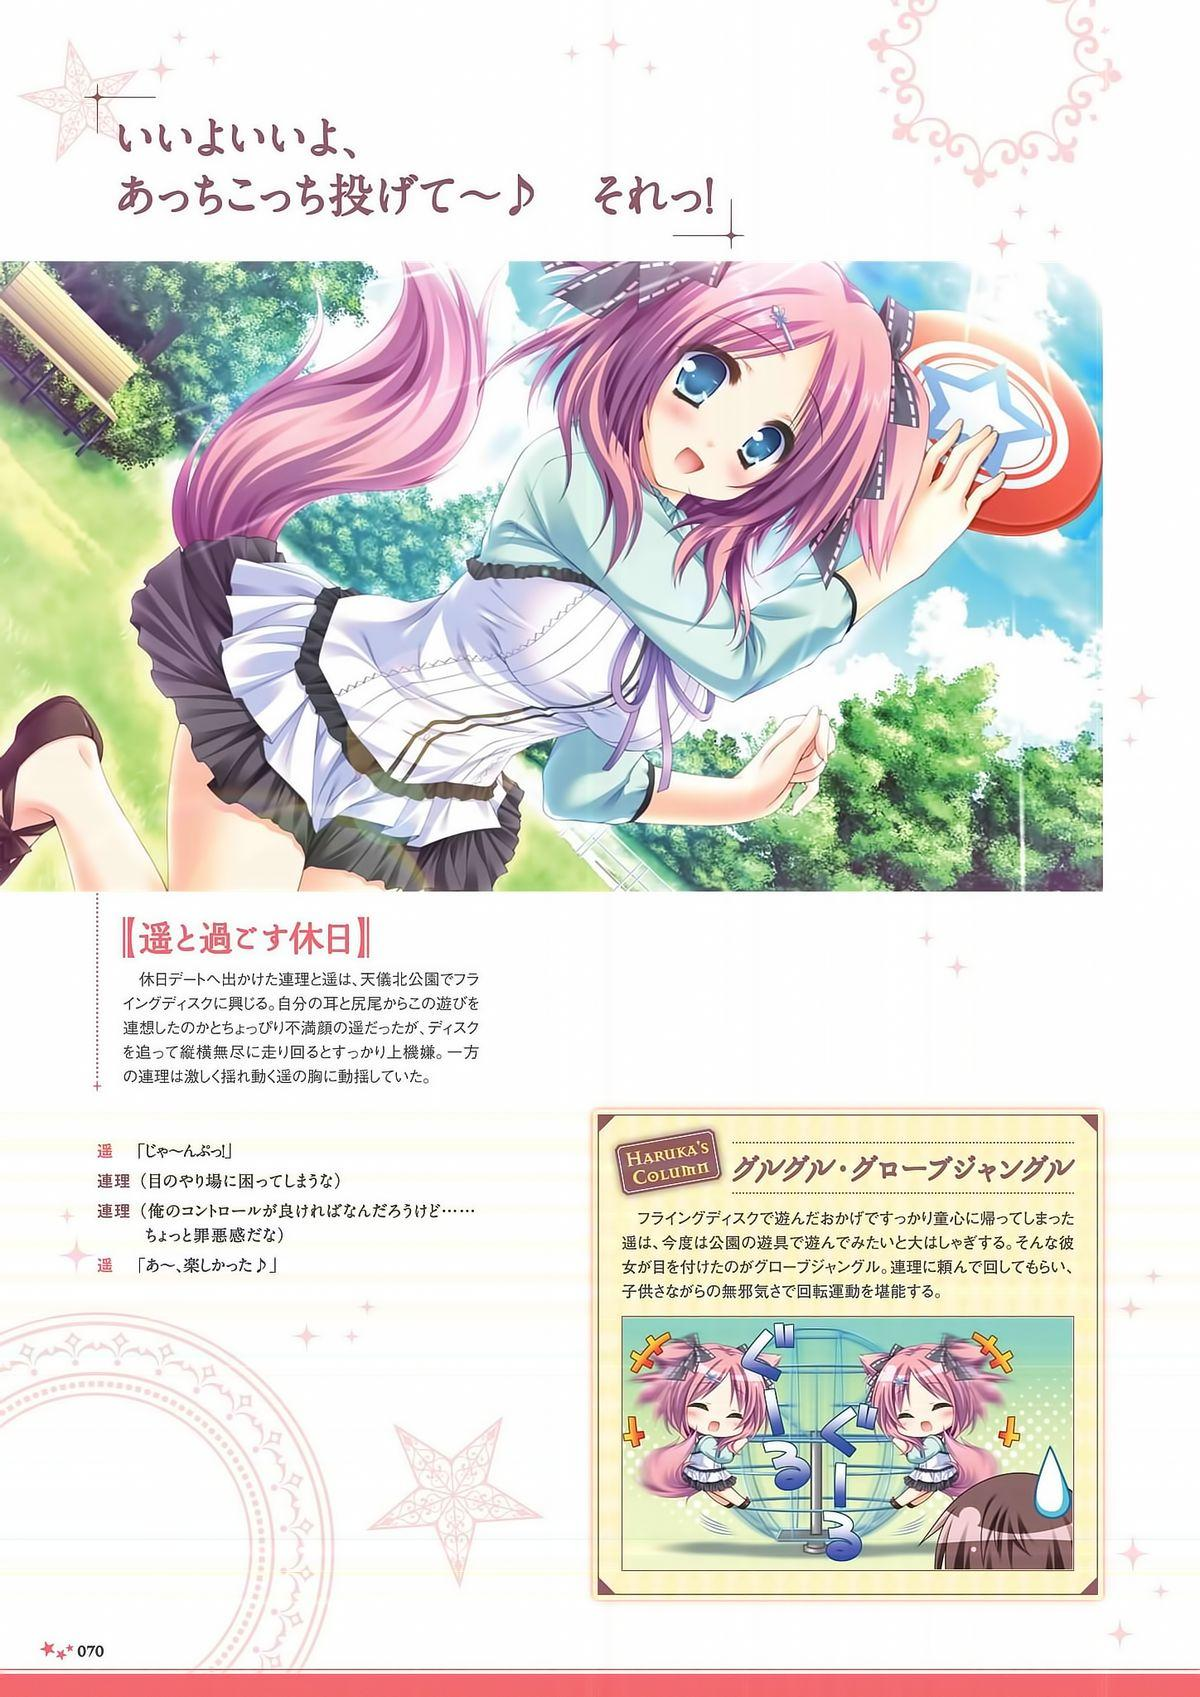 Sekai to Sekai no Mannaka de Visual Fanbook 70